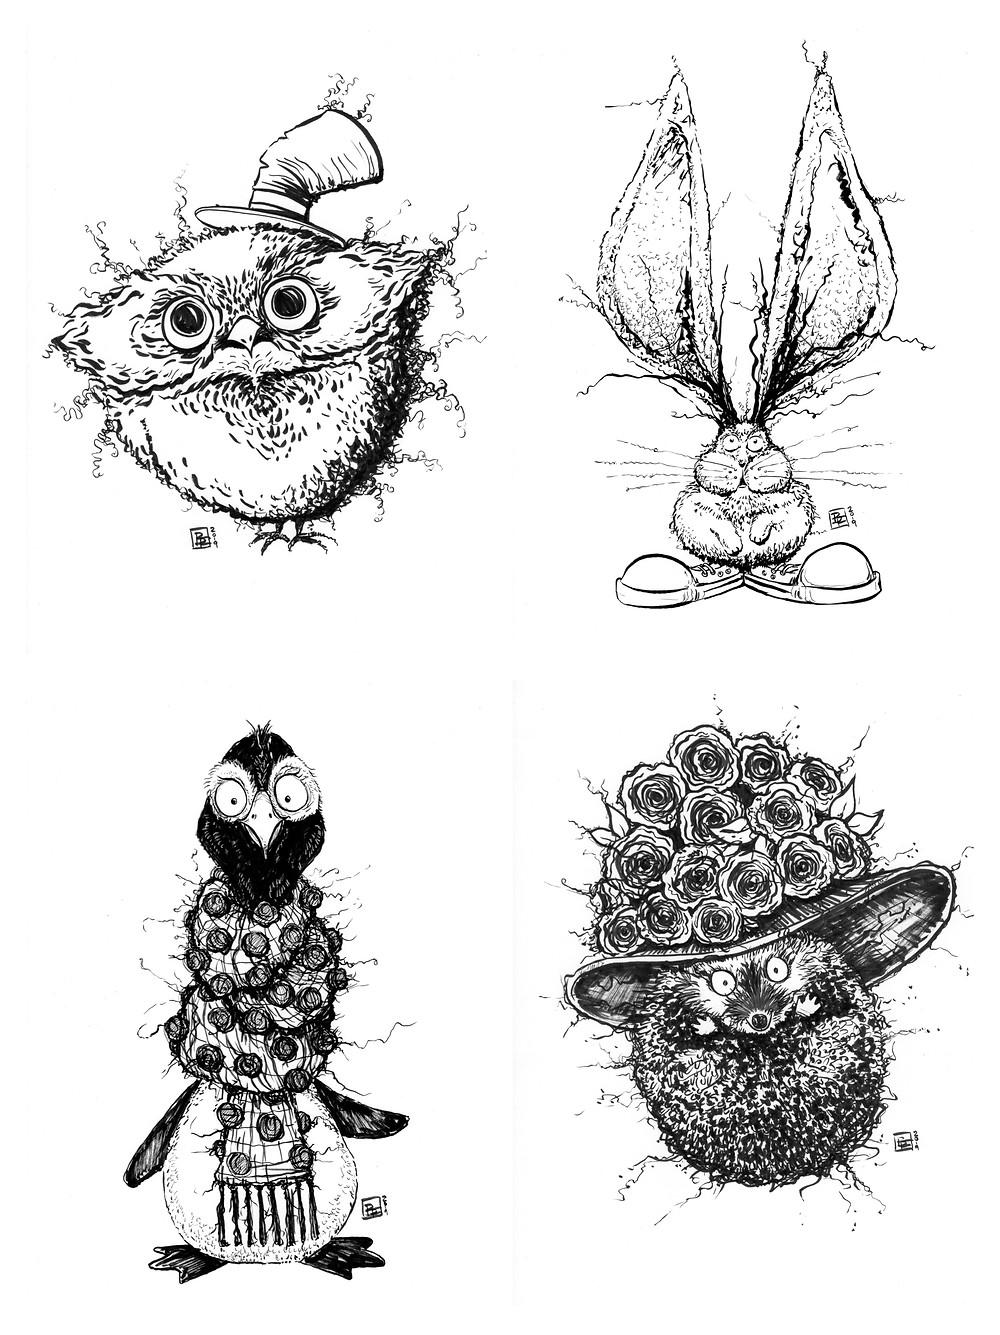 Cute fuzzy happy animal drawings (Owl, Bunny, Penguin, Hedgehog) for Inktober - Part 1